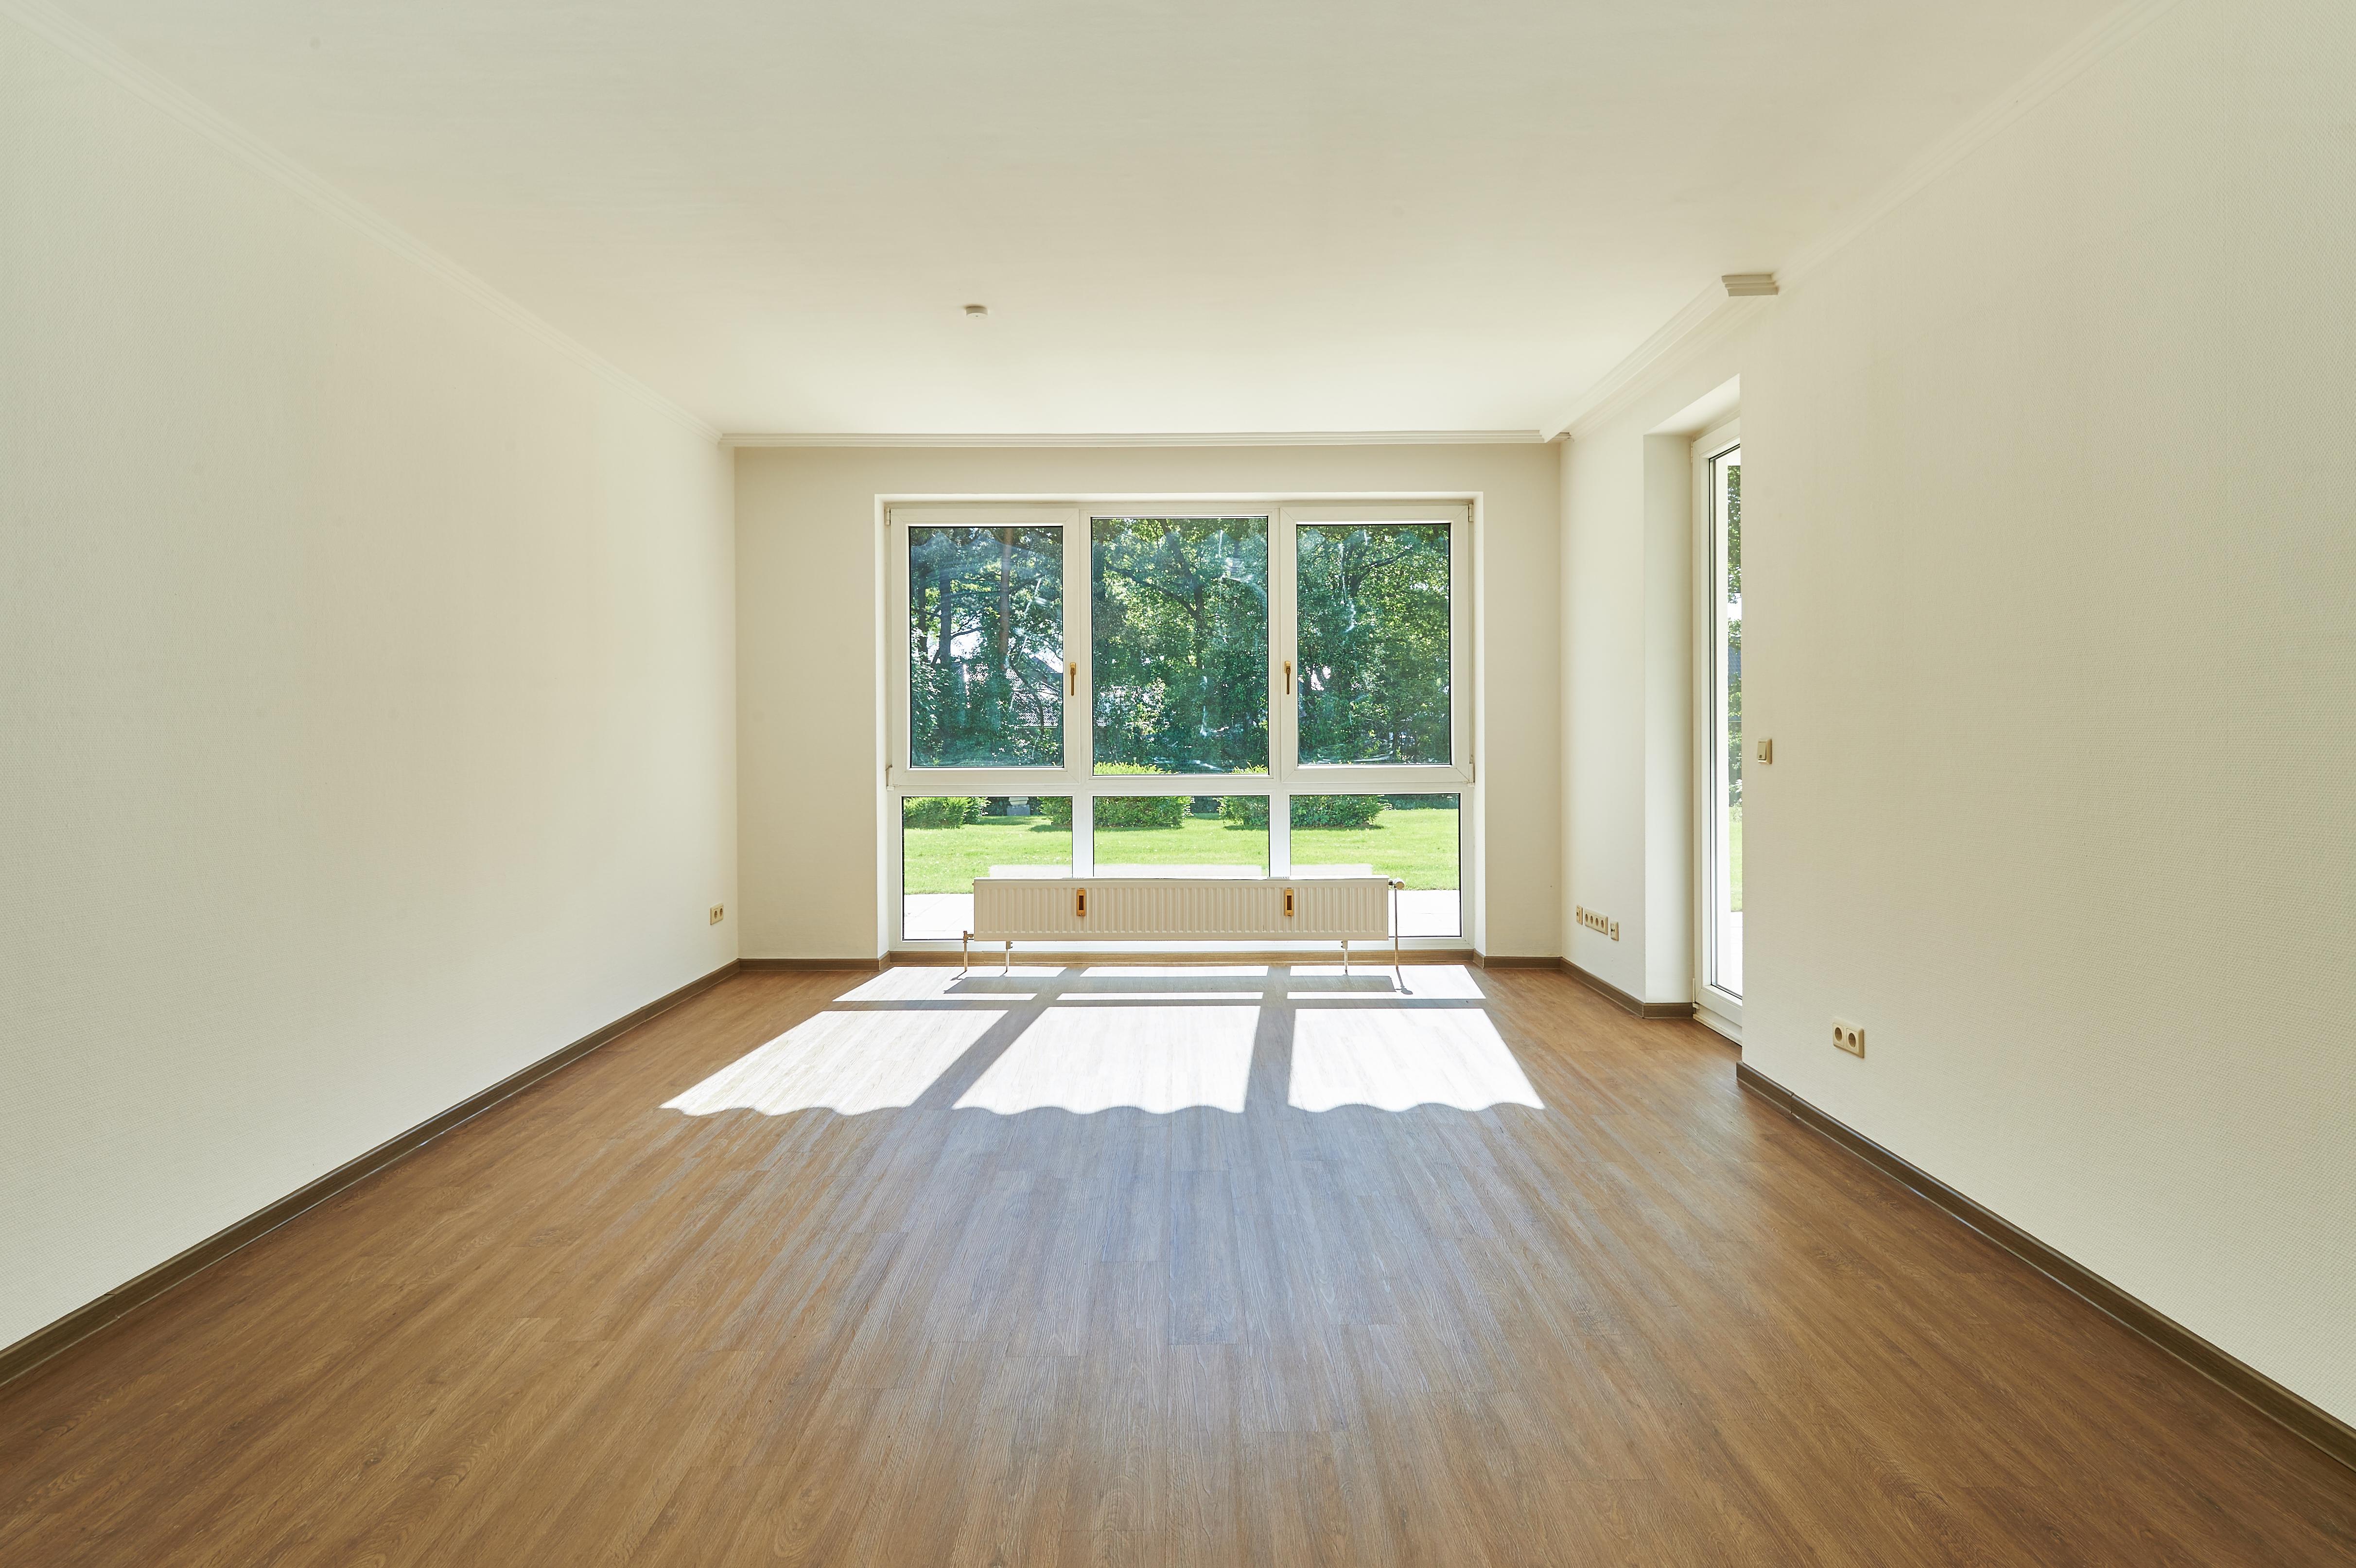 2018-05-08-Cinja-Bledschun-Immobilien-Tägtmeyerstraße-10-28309-Bremen-001